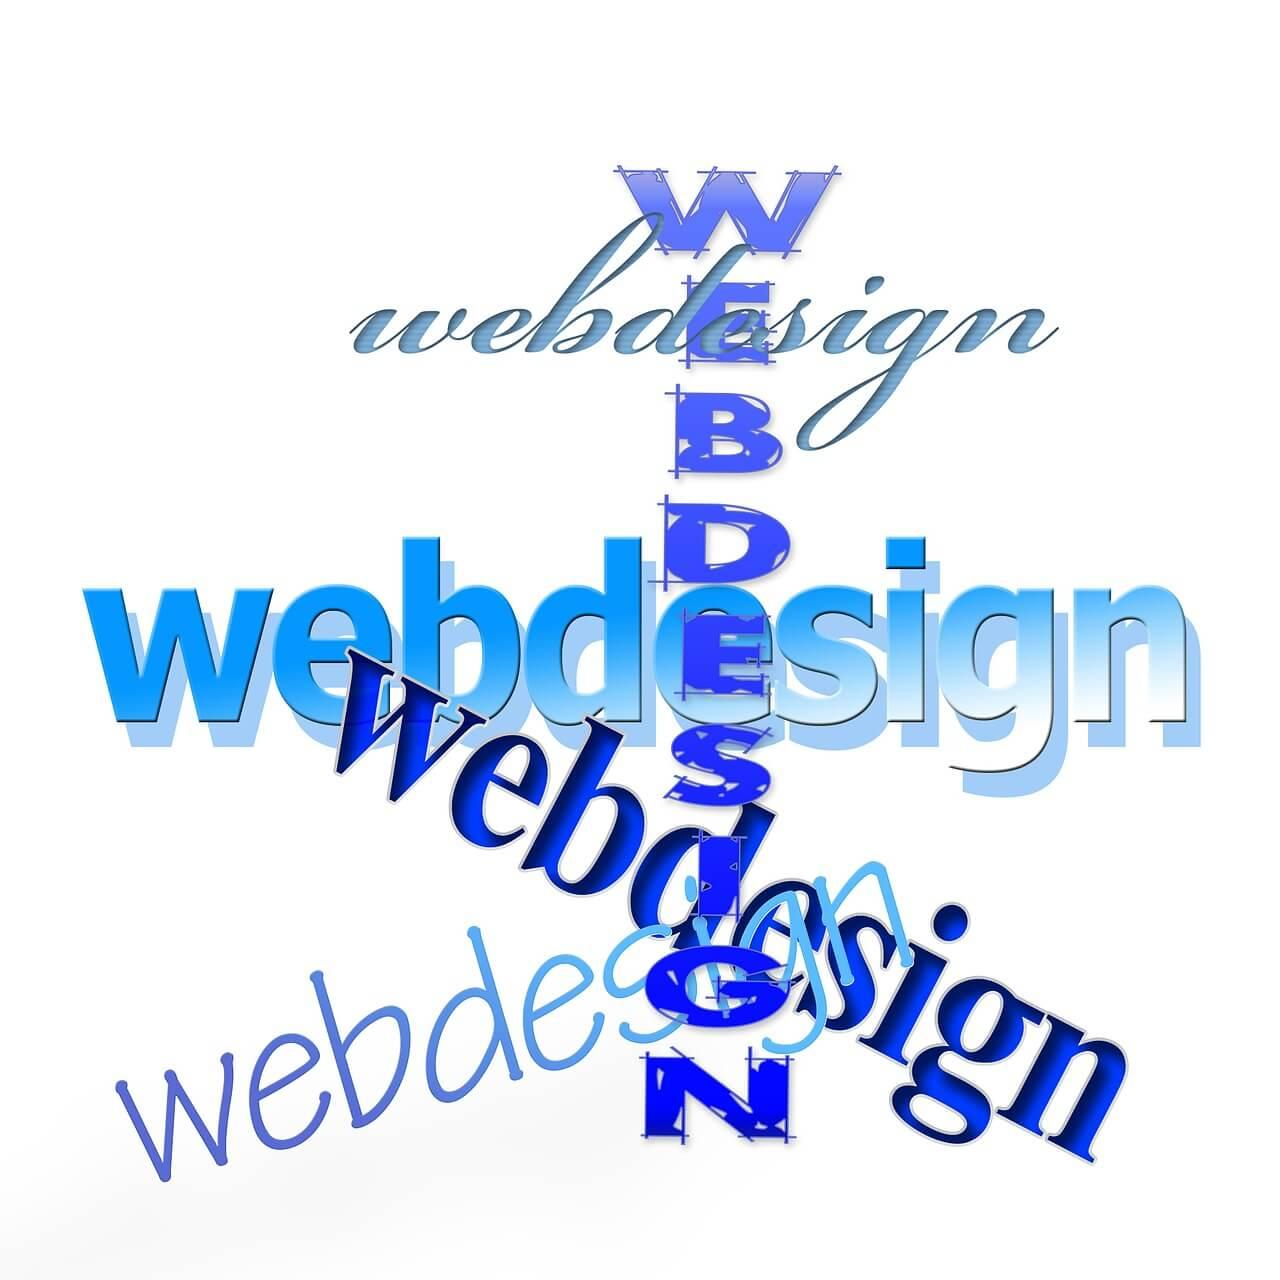 responsive-website-design-india